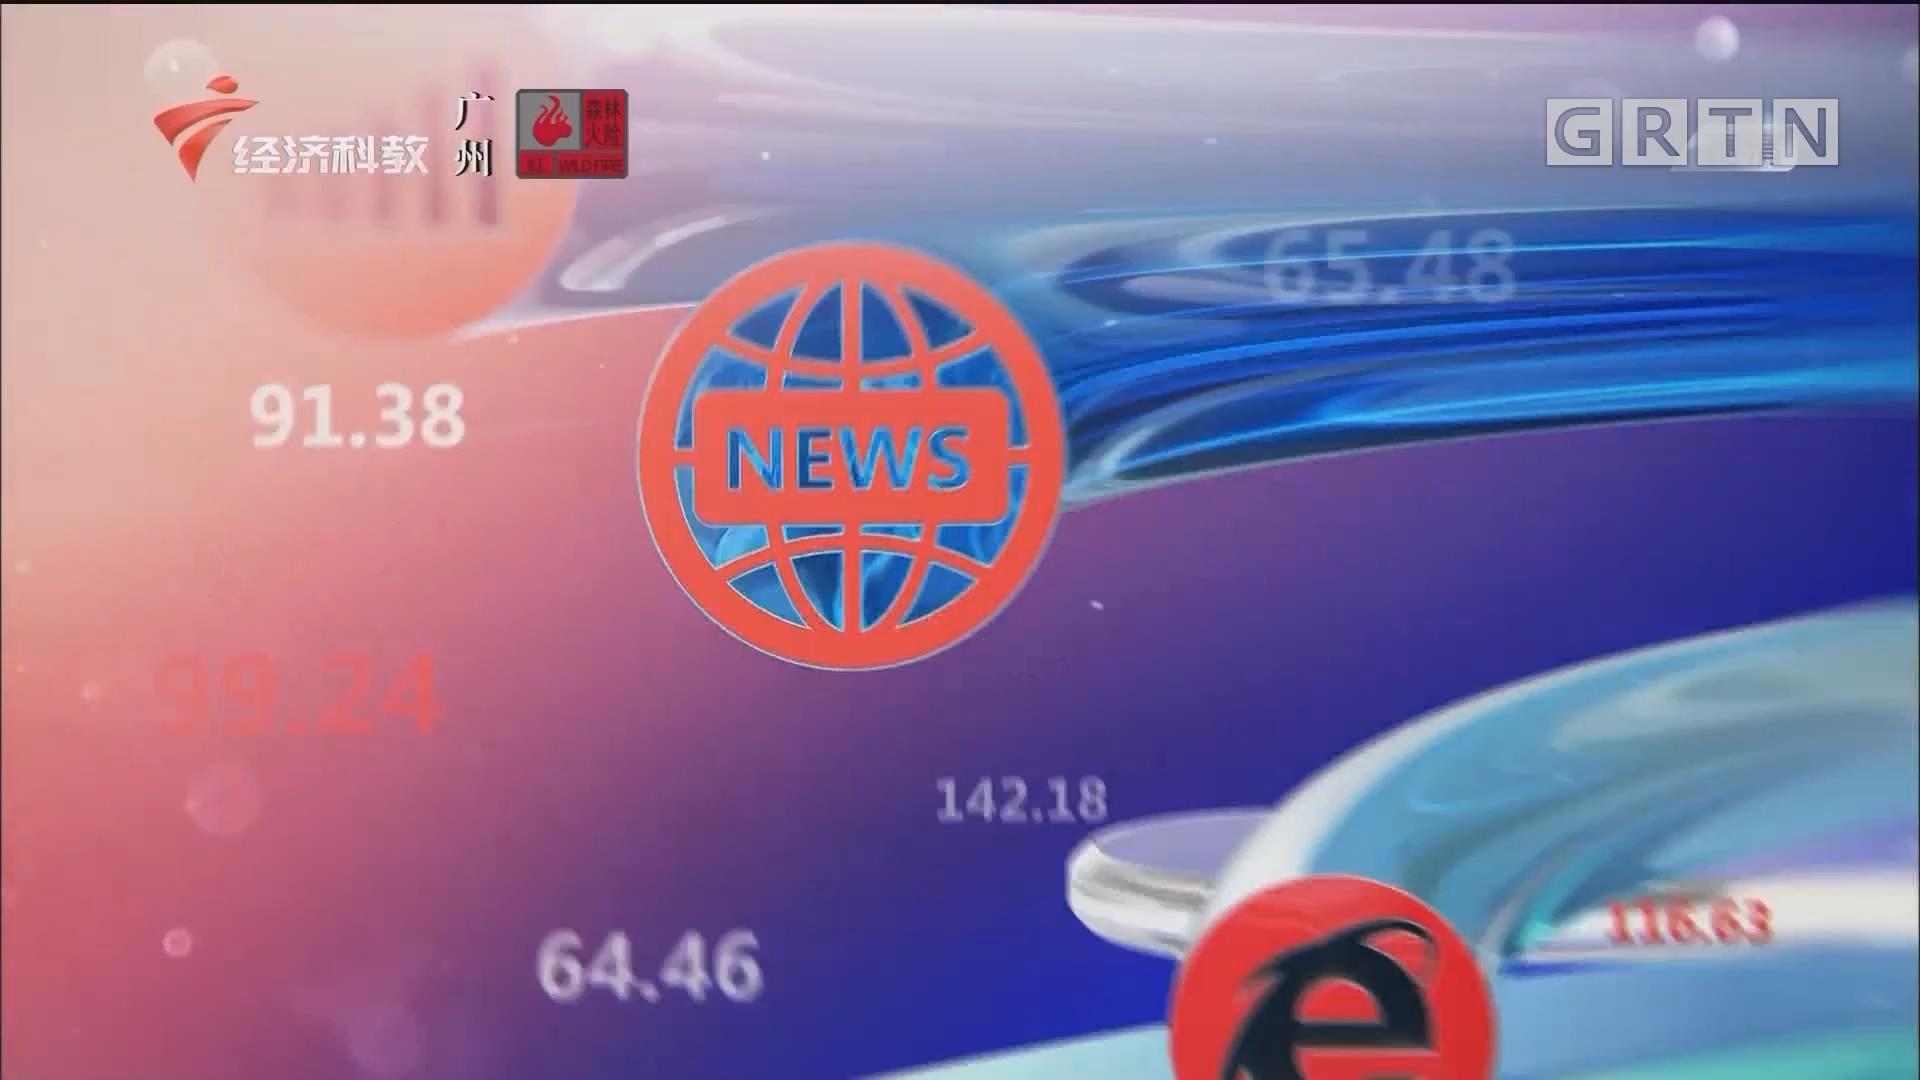 [HD][2020-01-14]南方财经报道:广东省第十三届人民代表大会第三次会议